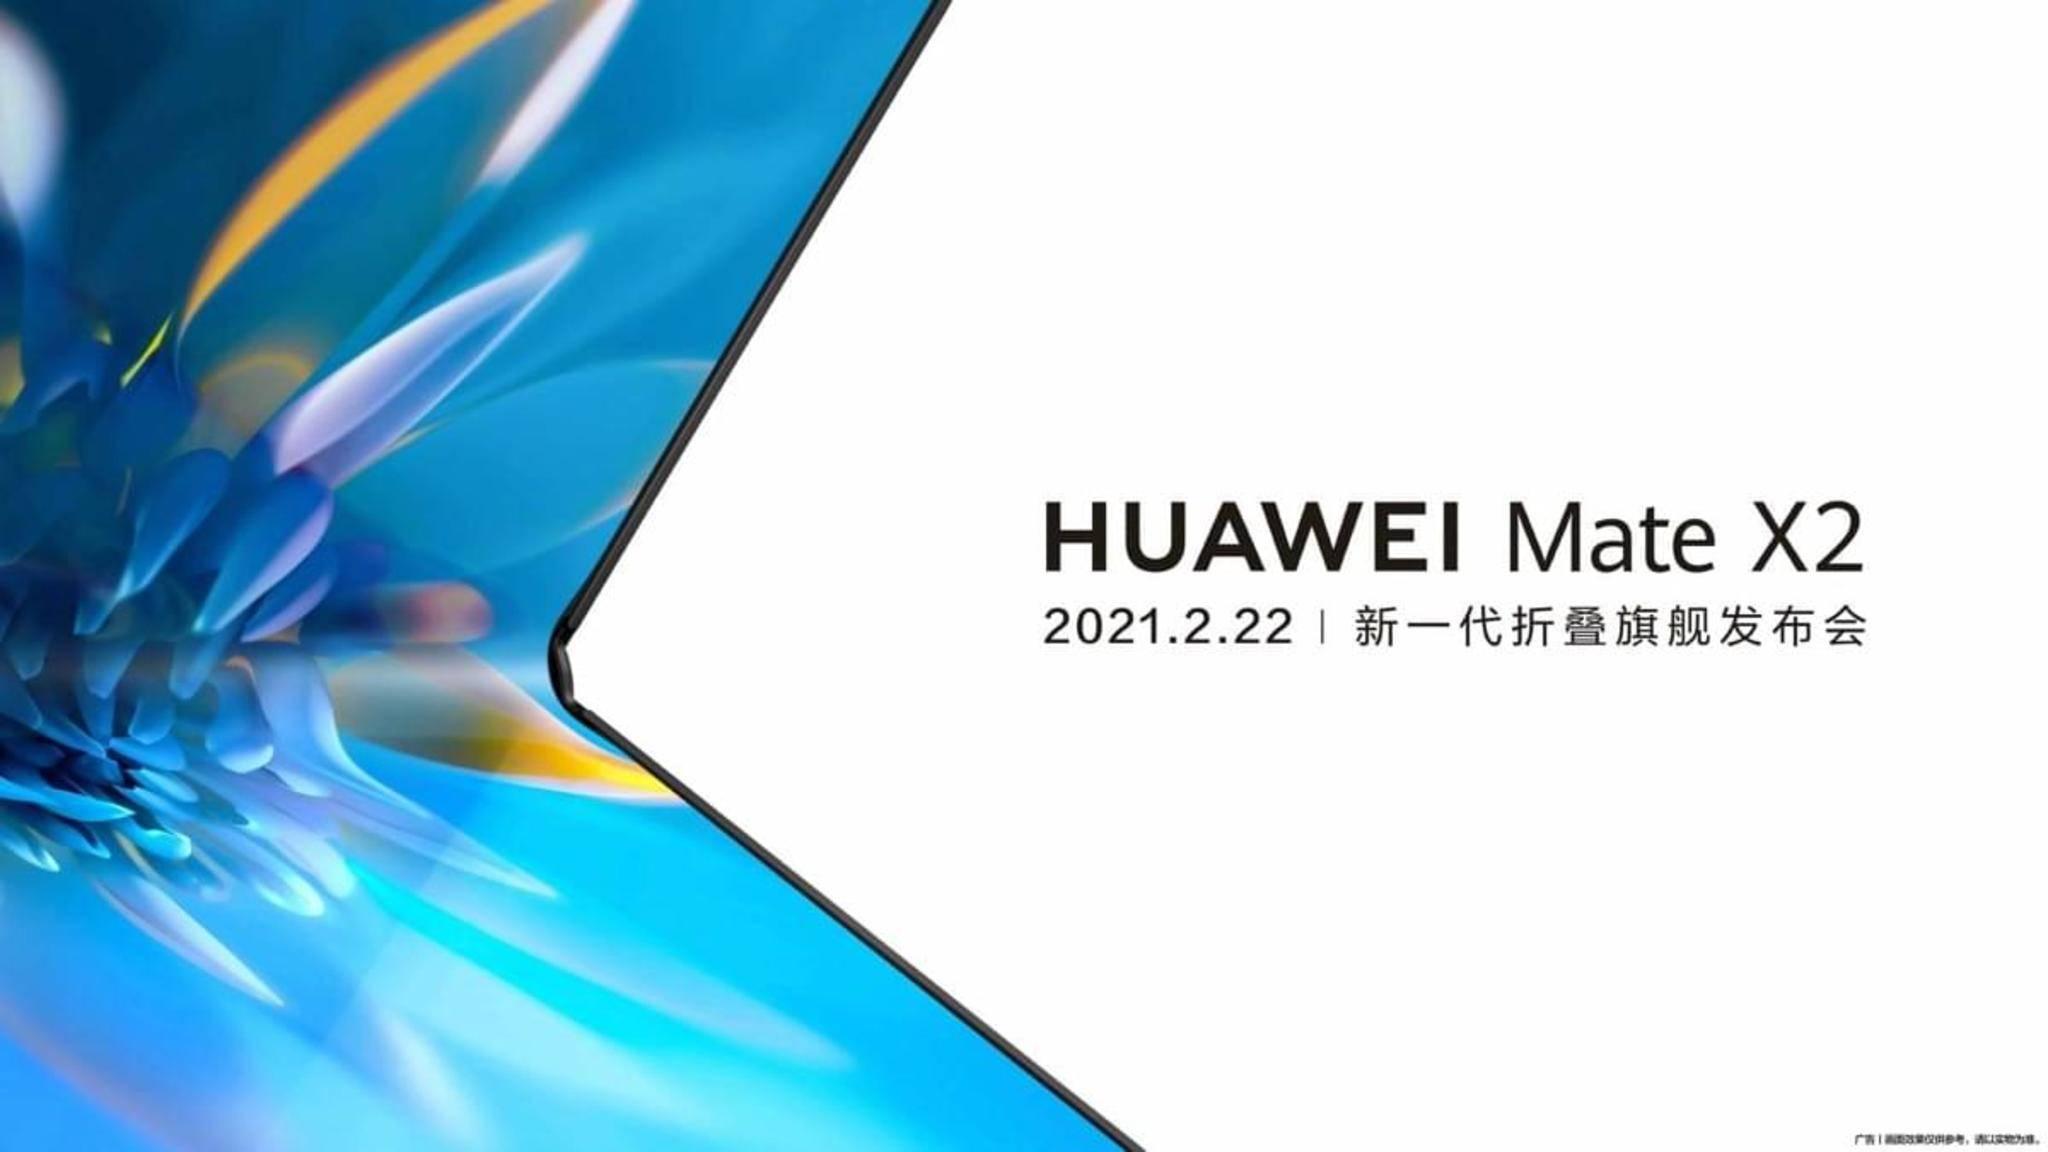 Huawei hat den Termin mitgeteilt, an dem das Huawei Mate X2 das Licht der Welt erblicken soll.